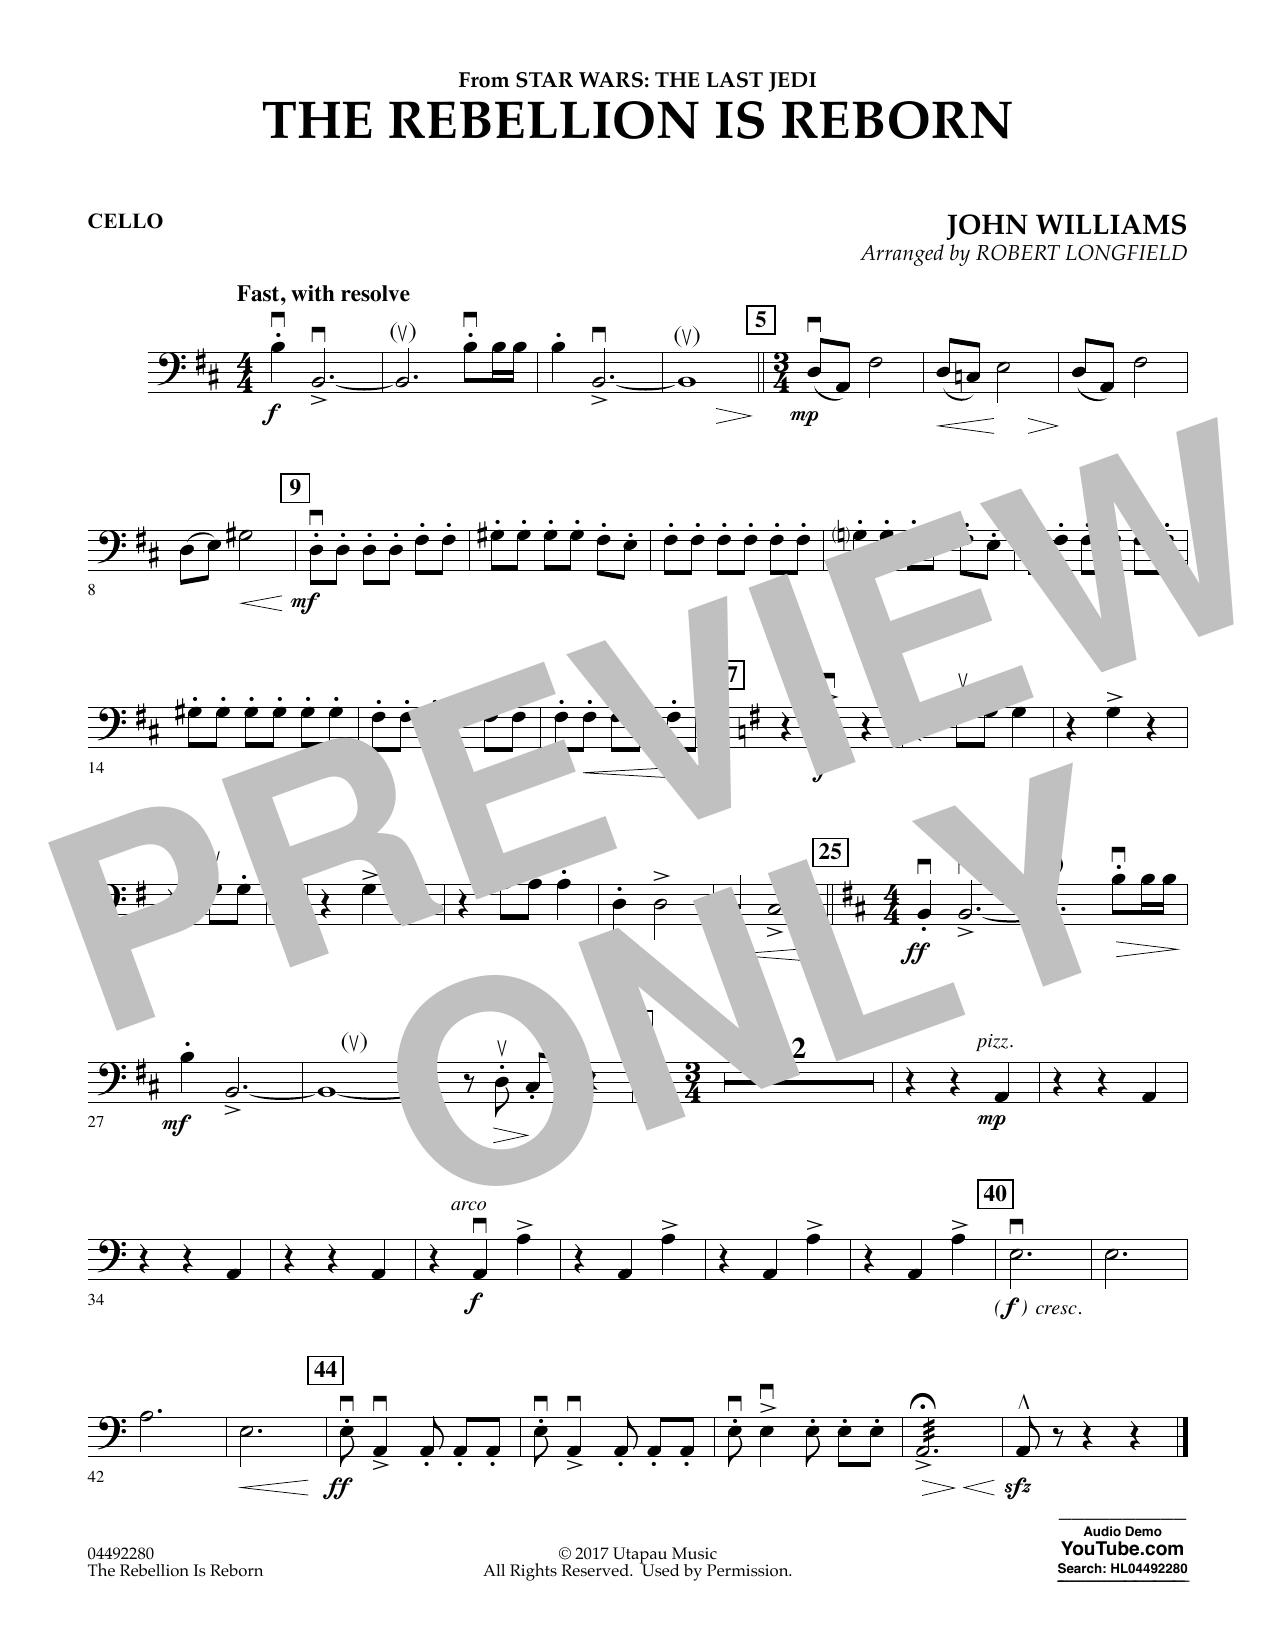 The Rebellion Is Reborn (from Star Wars: The Last Jedi) - Cello (Orchestra)